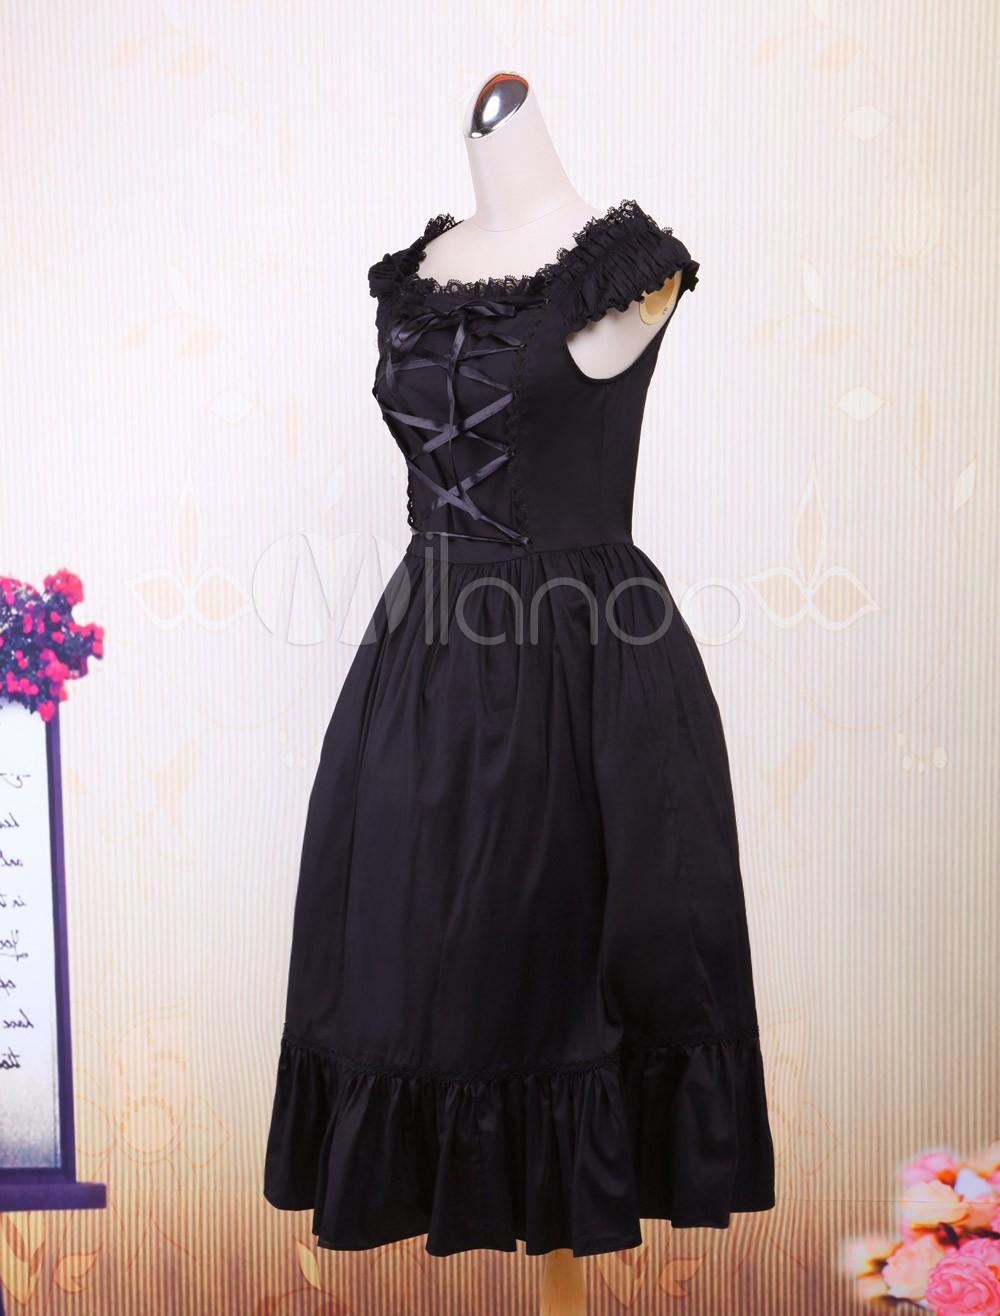 Next Pink Dress Baby Girls 6-9m Sales Of Quality Assurance Girls' Clothing (newborn-5t) Symbol Of The Brand W5